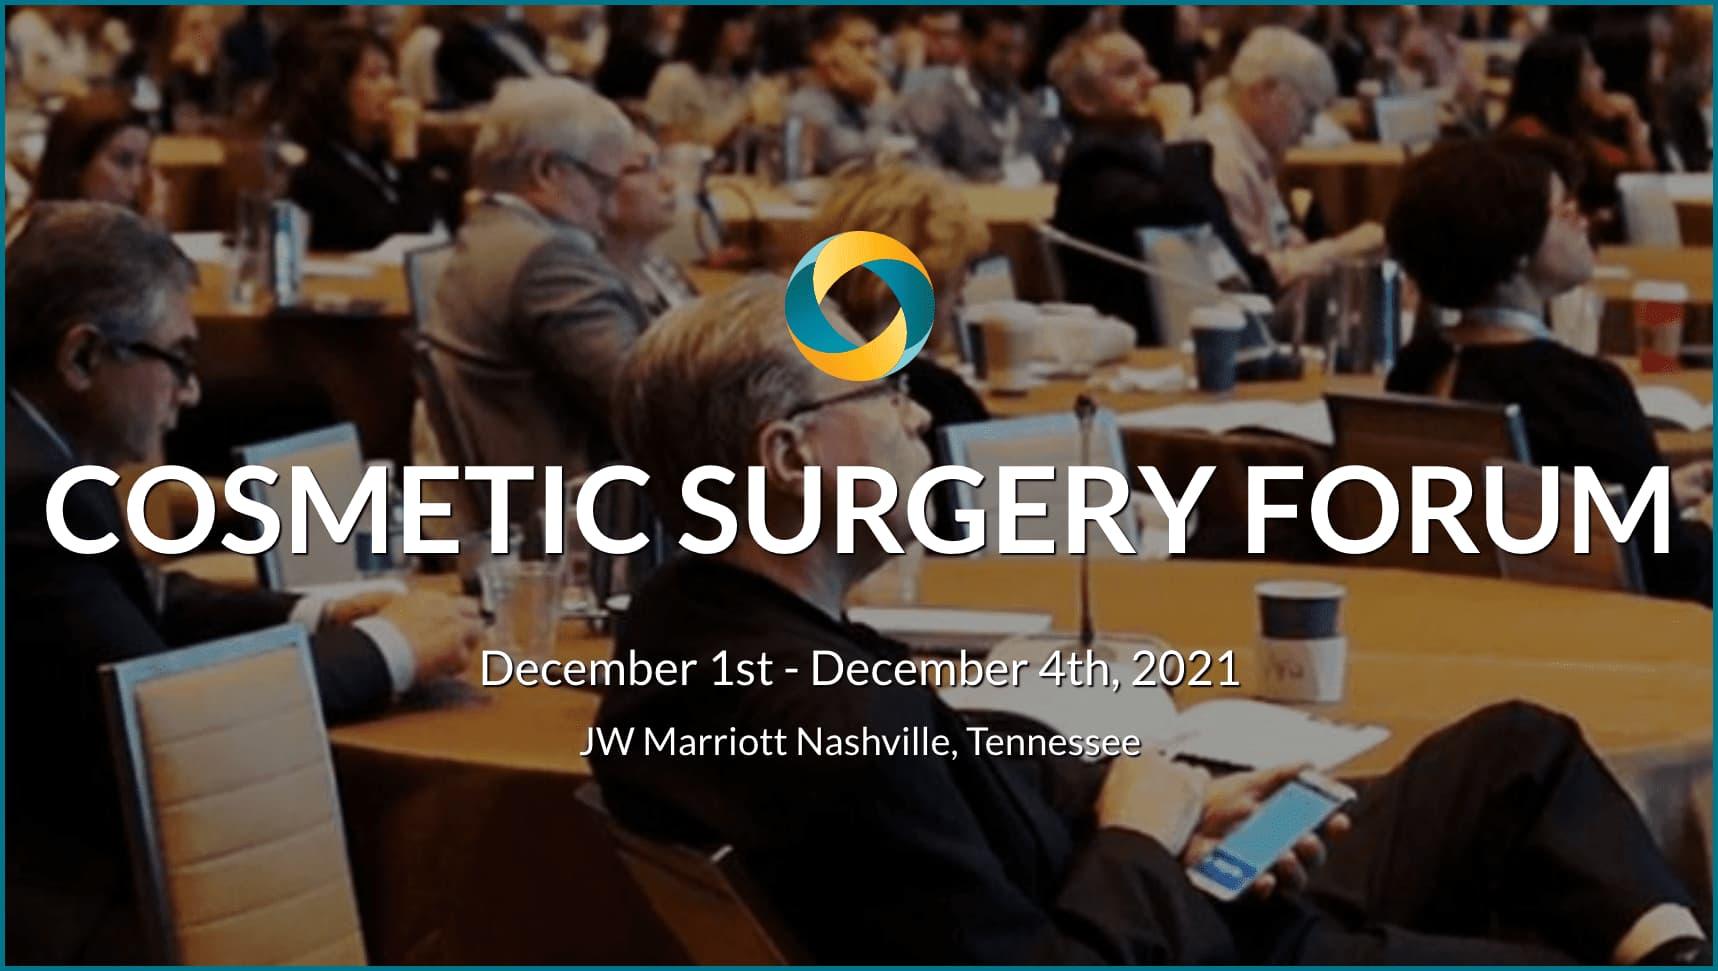 Cosmetic Surgery Forum - UX Design, Neil Humphrey